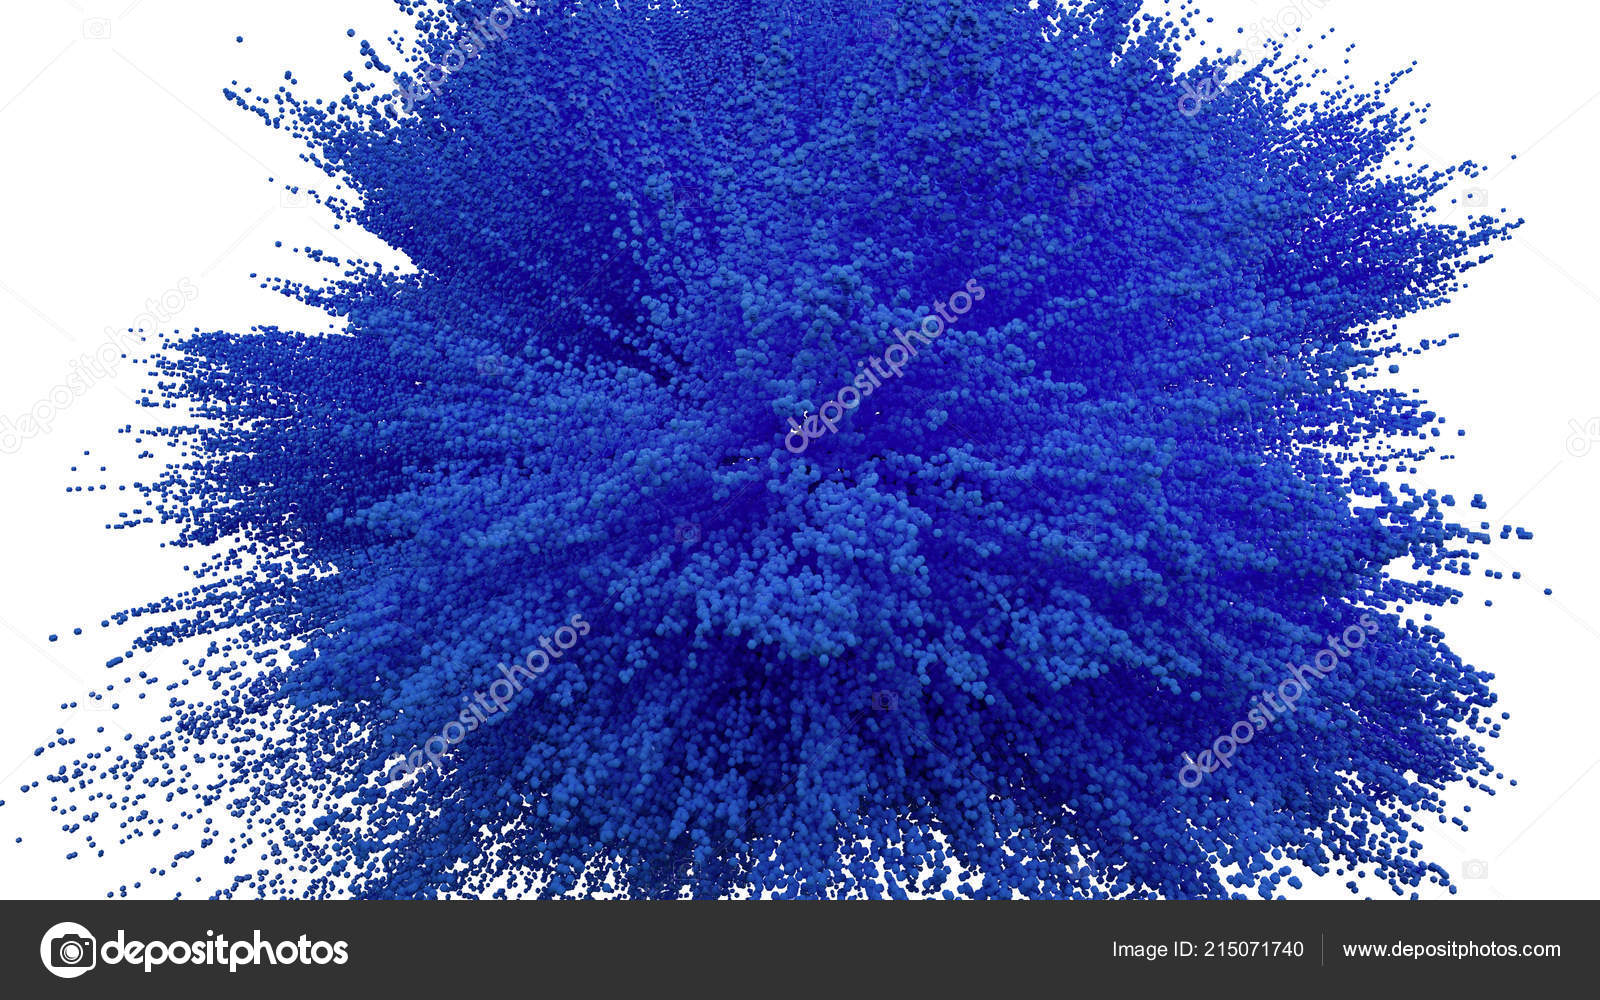 blue powder ball explosion white background blue cloud blue dust